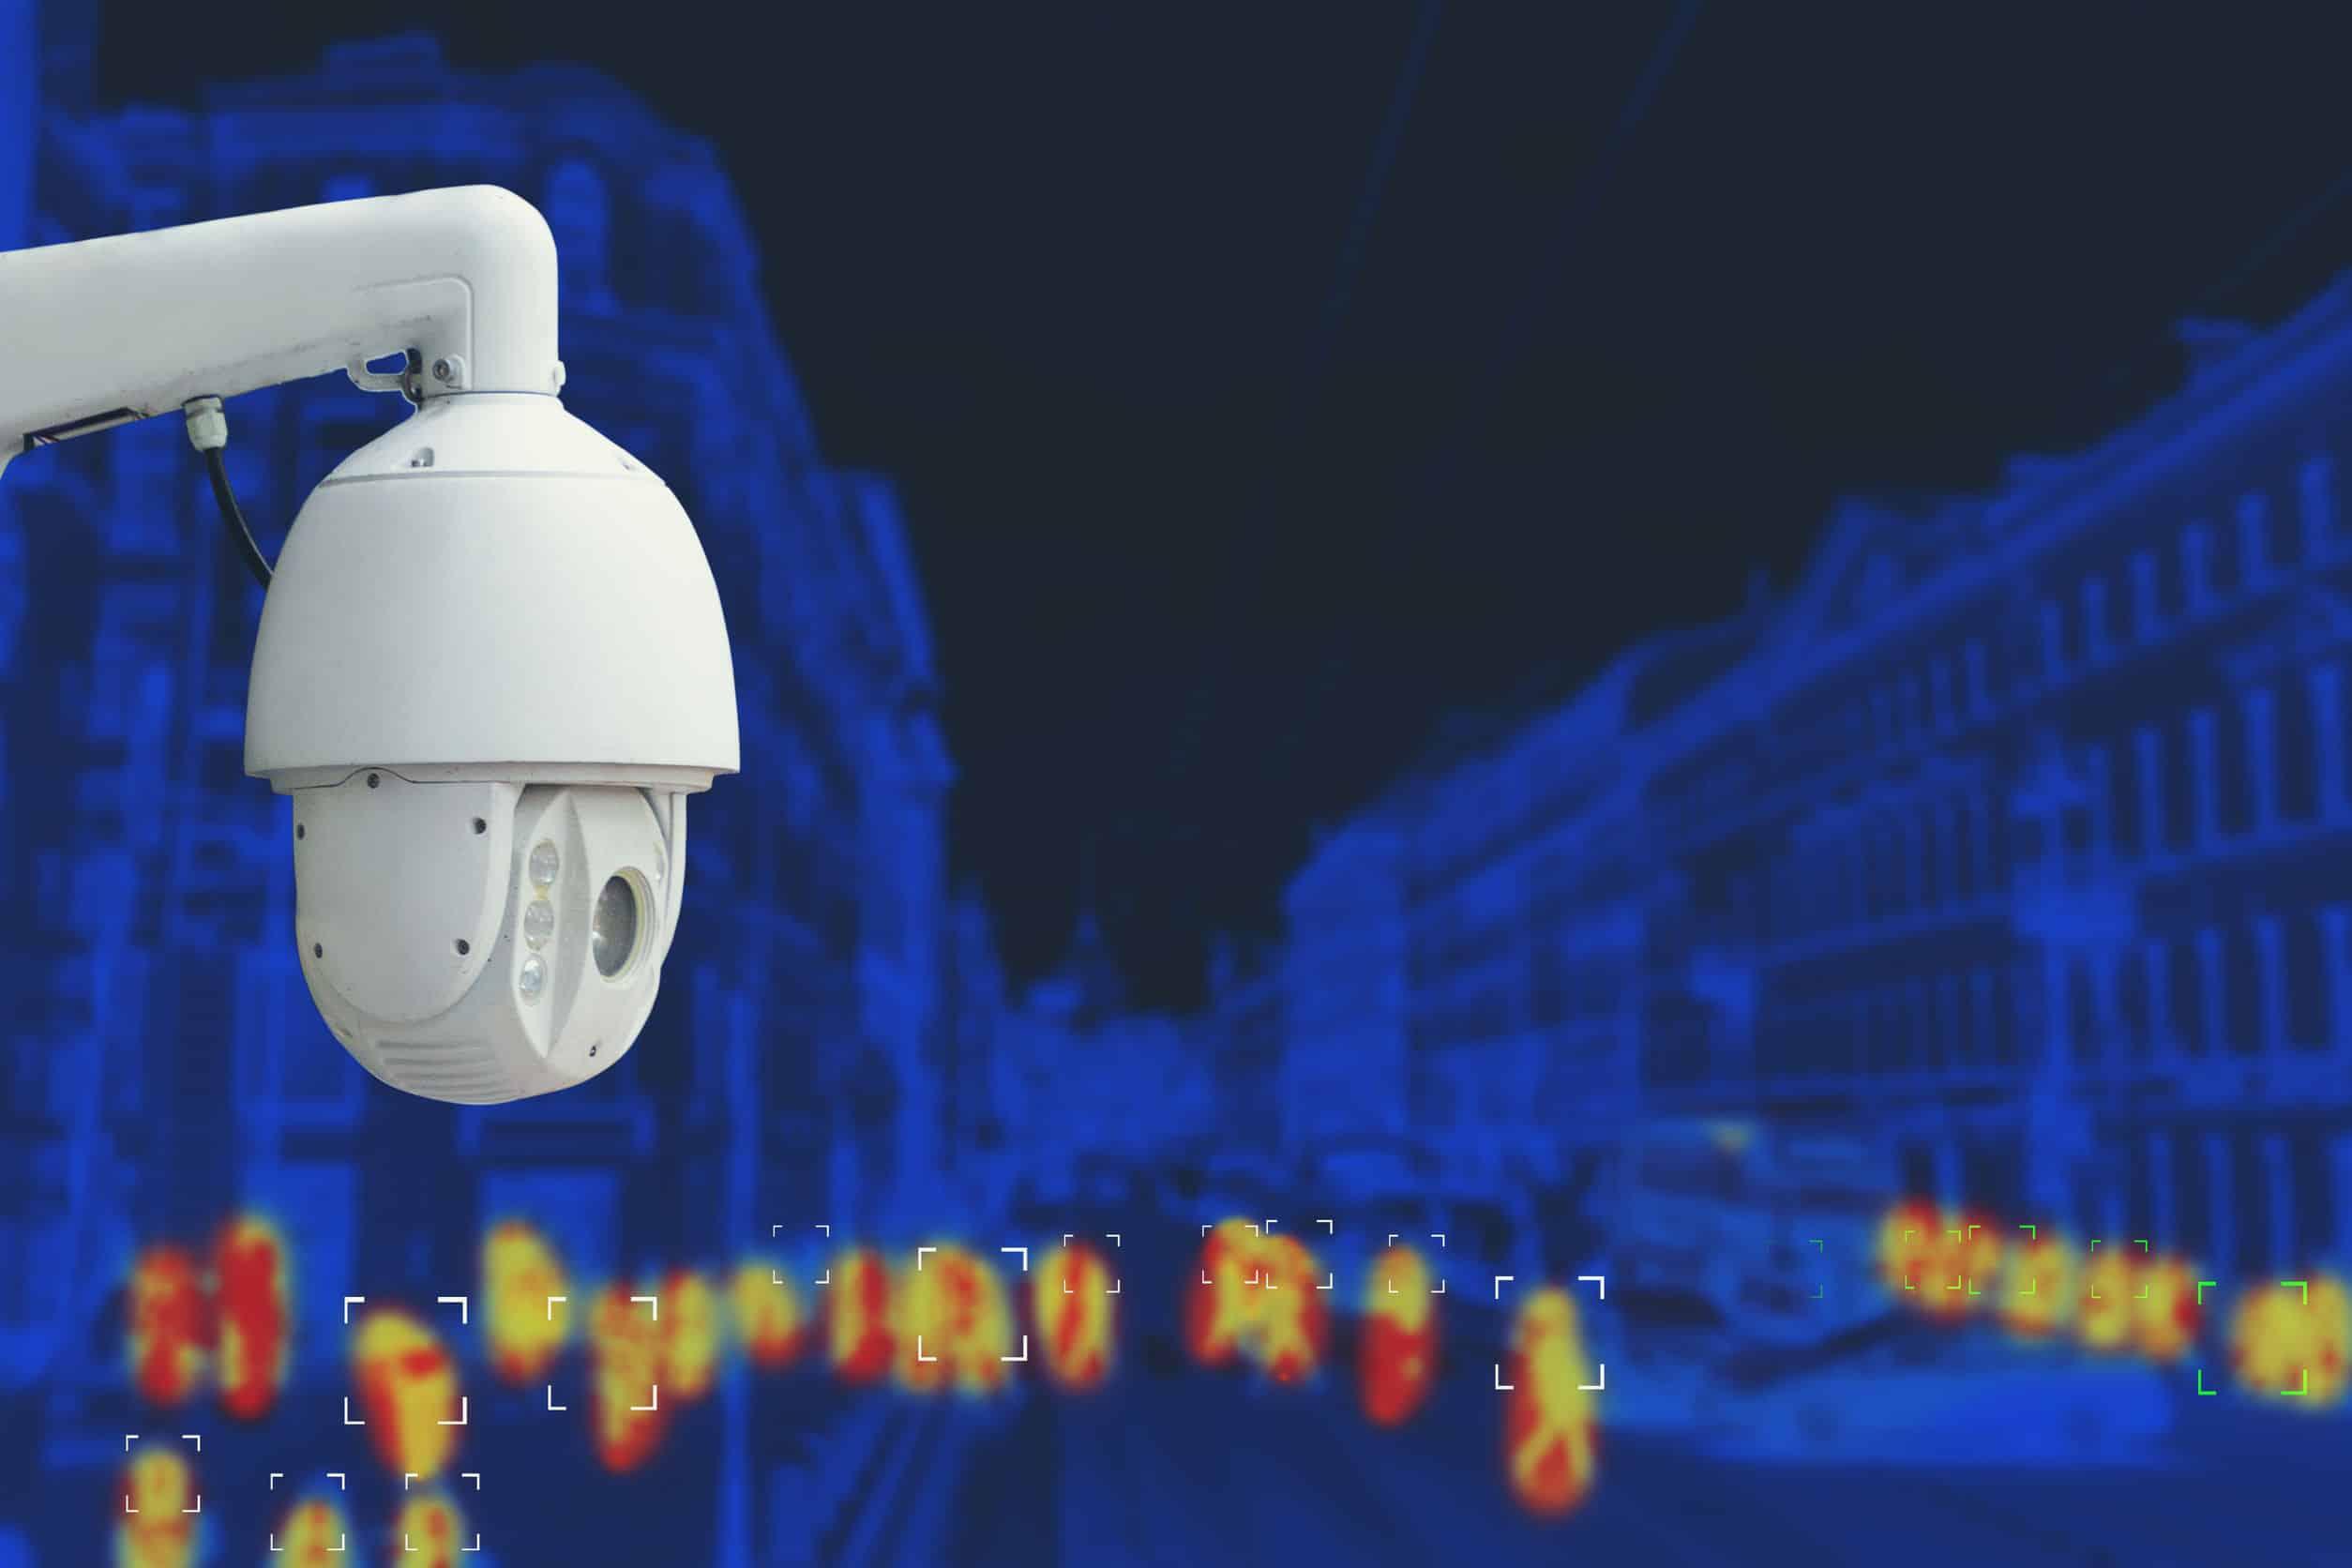 Surveillance Installation in Tulsa